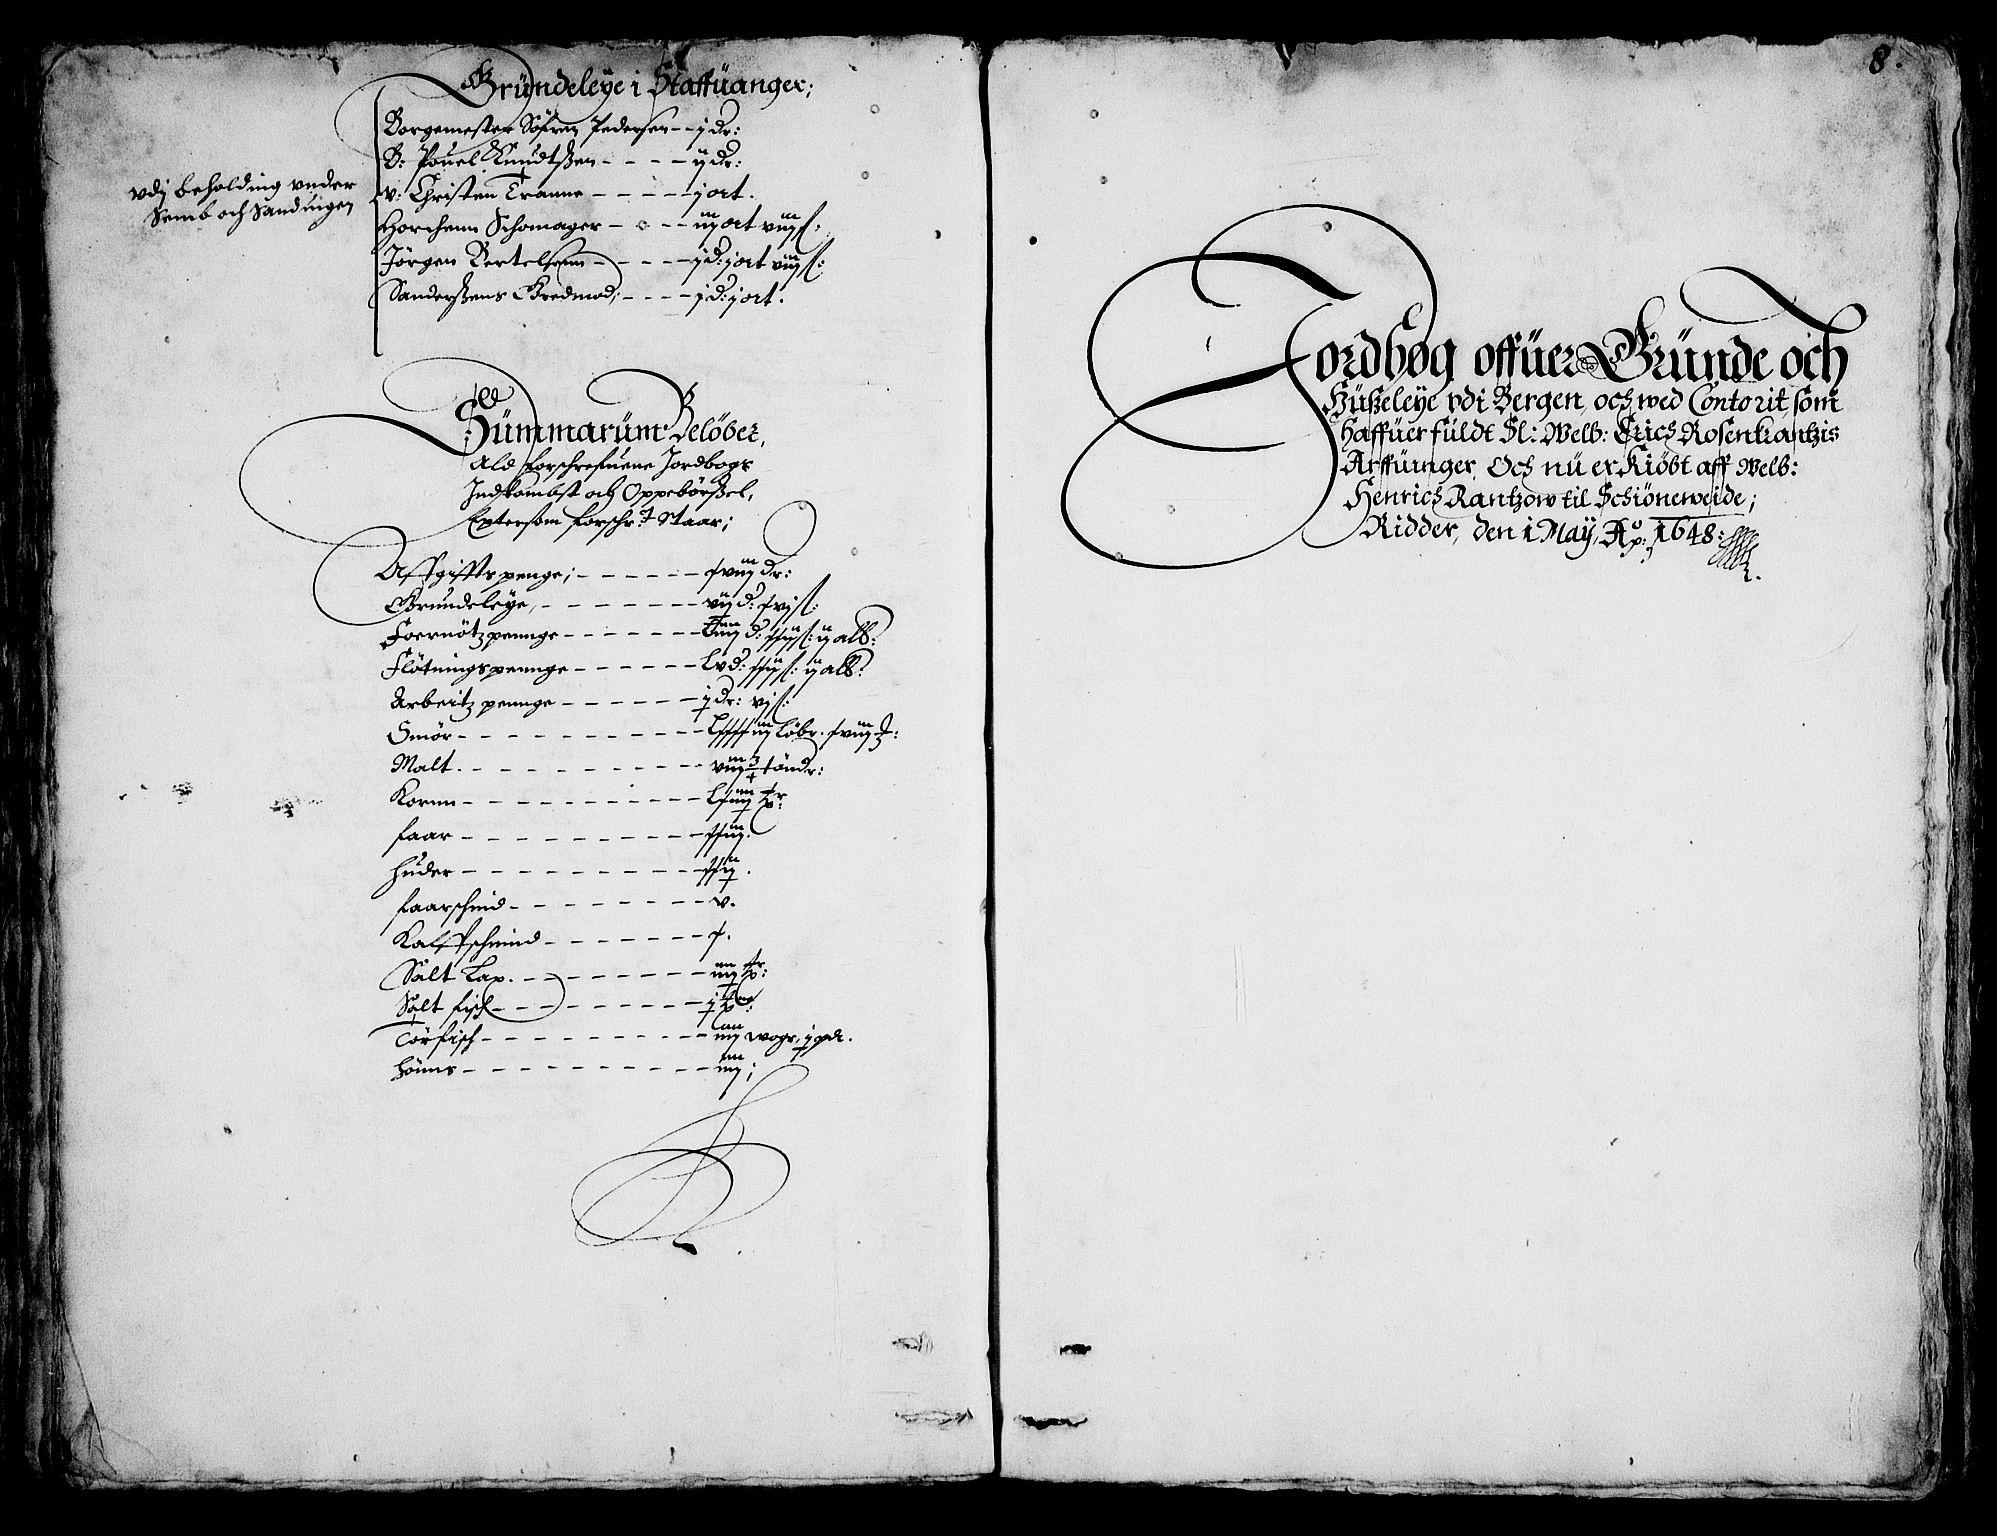 RA, Rentekammeret inntil 1814, Realistisk ordnet avdeling, On/L0001: Statens gods, 1651, s. 1007b-1008a